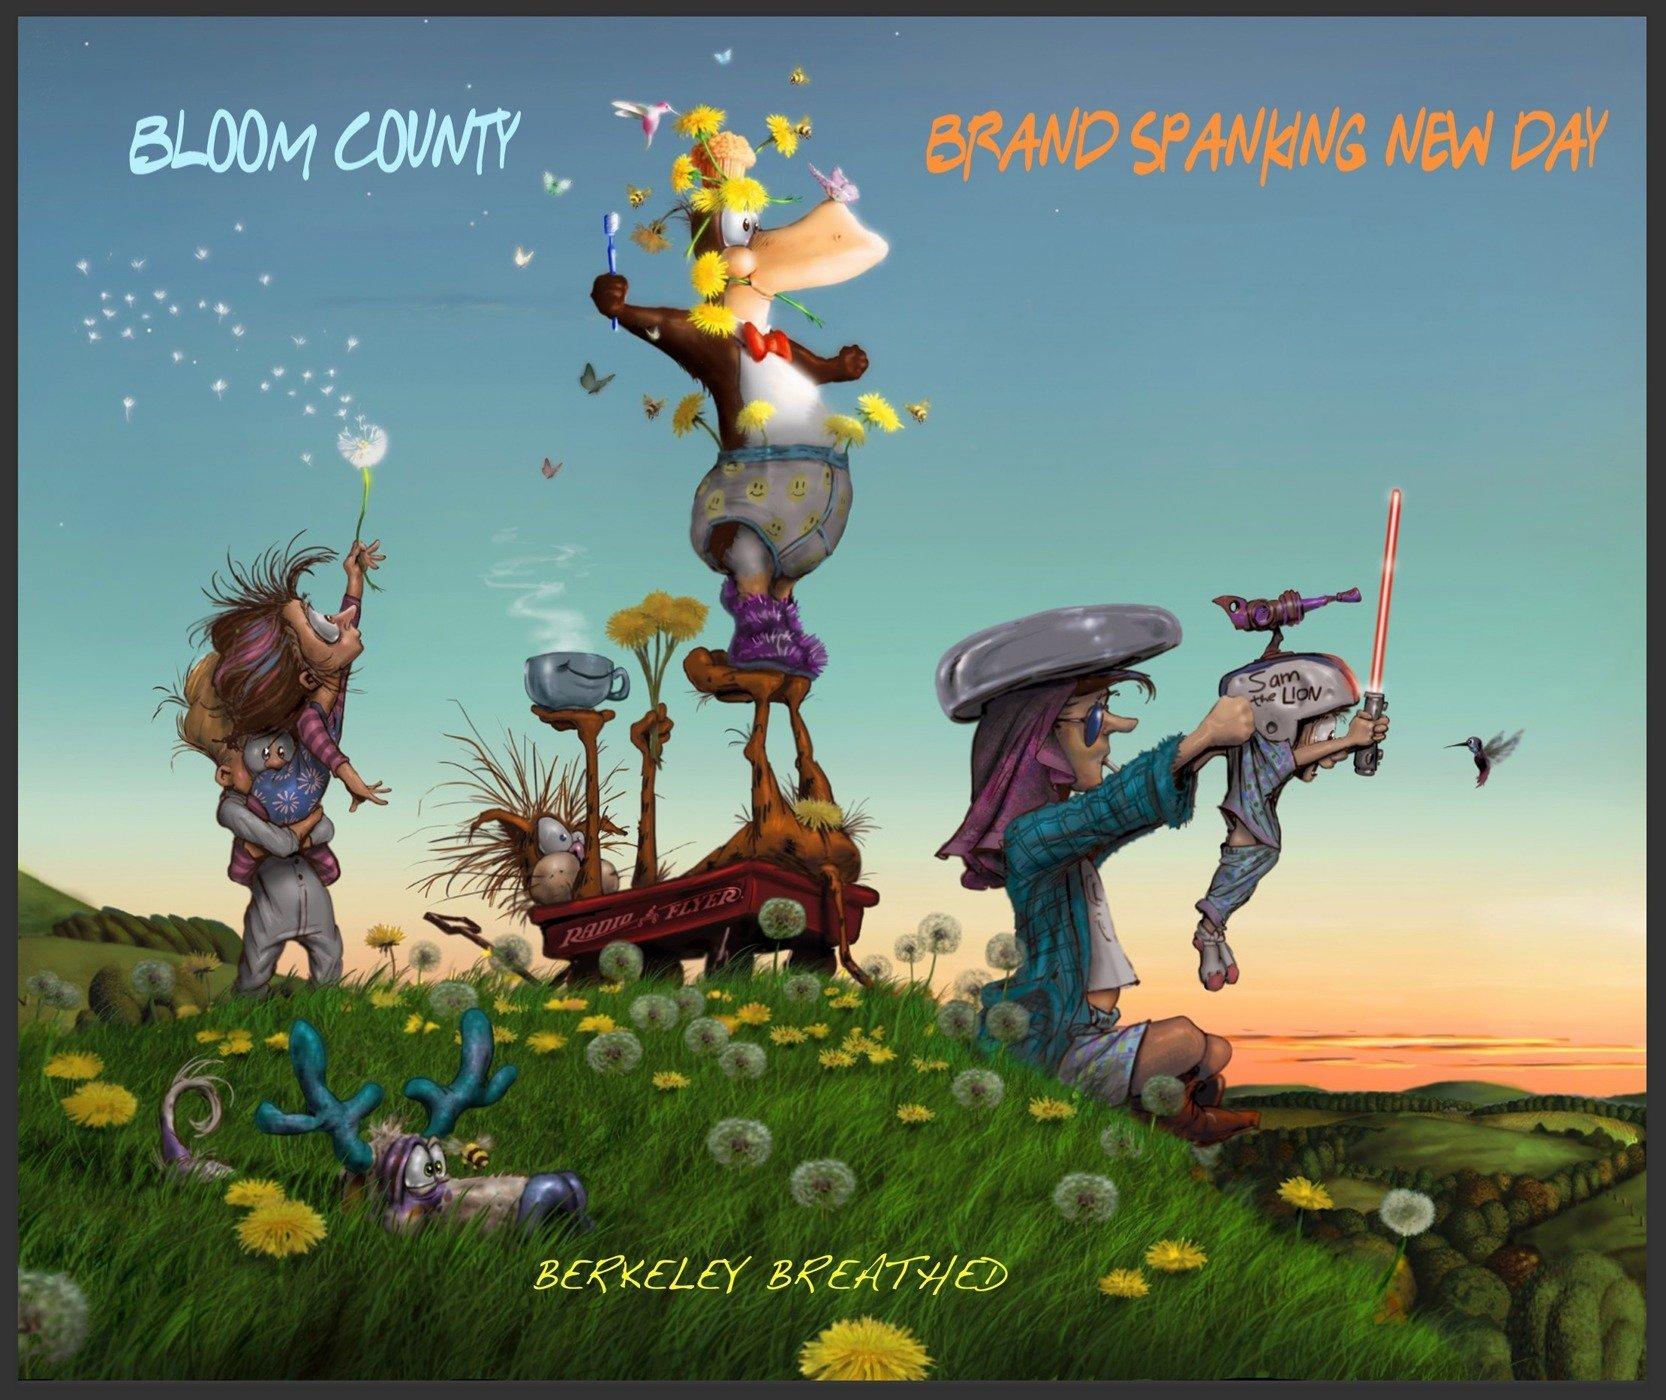 634ec931b29 Bloom County  Brand Spanking New Day  Berkeley Breathed ...